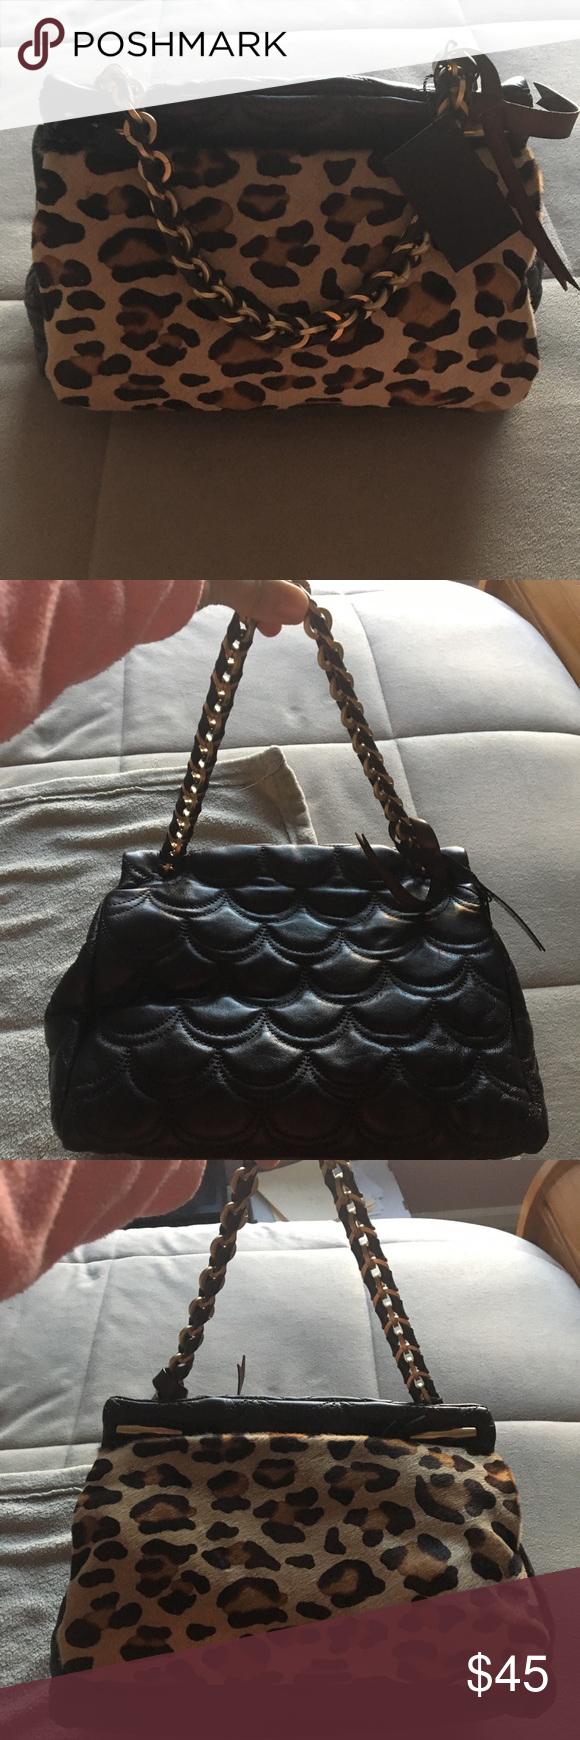 2f24fb69c0d7 Leather · DESMO HANDBAG ...